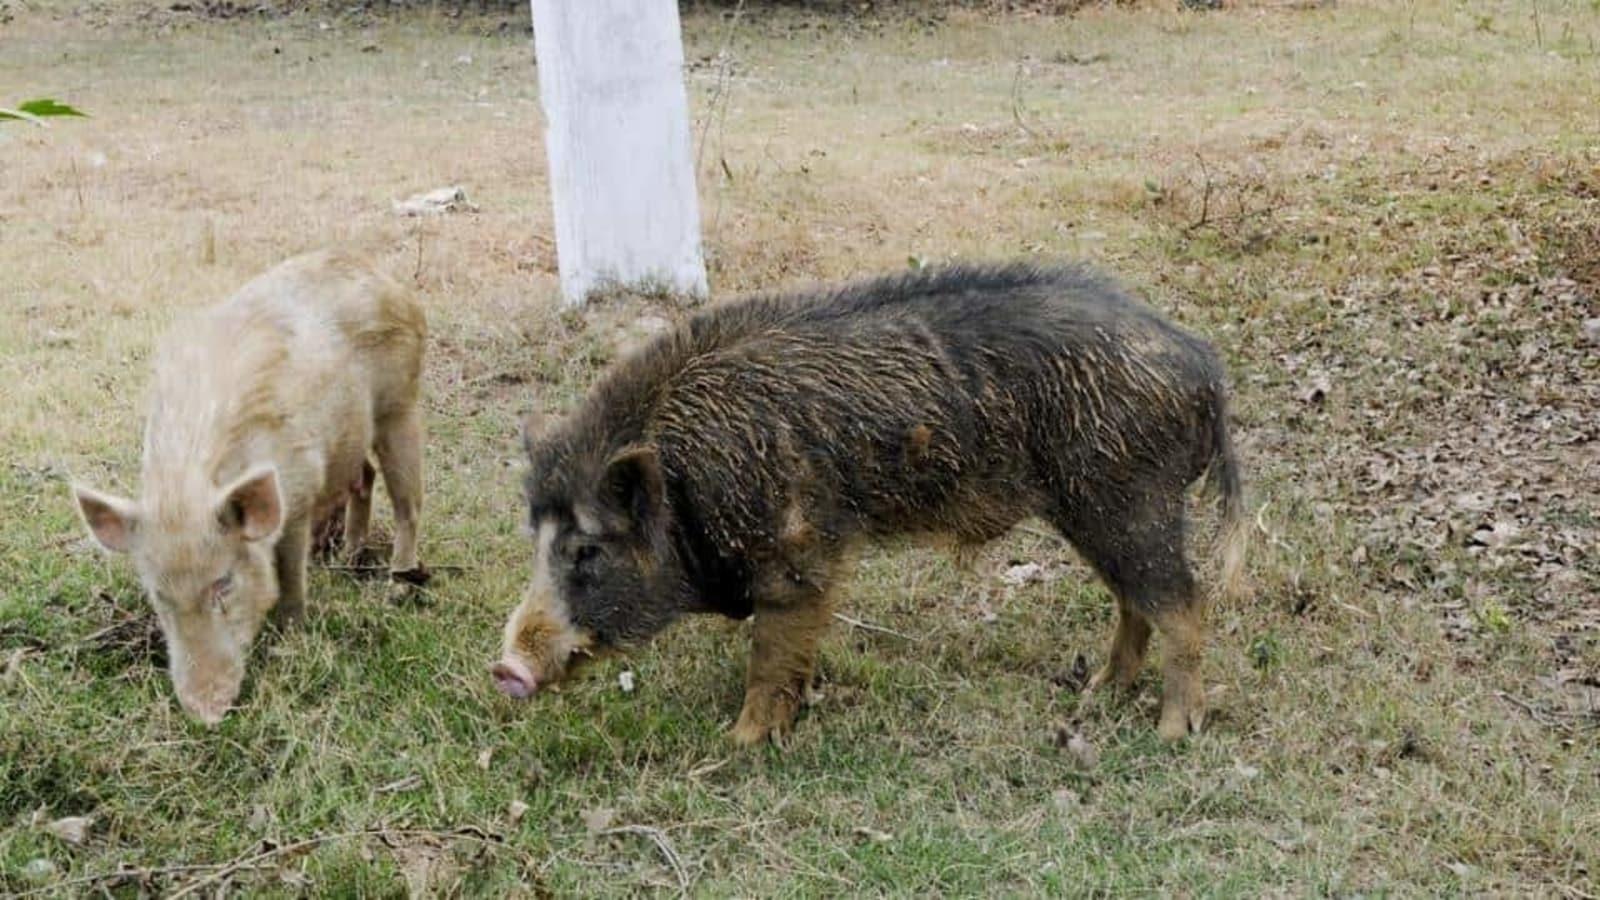 87 pigs die in Mizoram village near Bangladesh border, panic over ASF suspicion